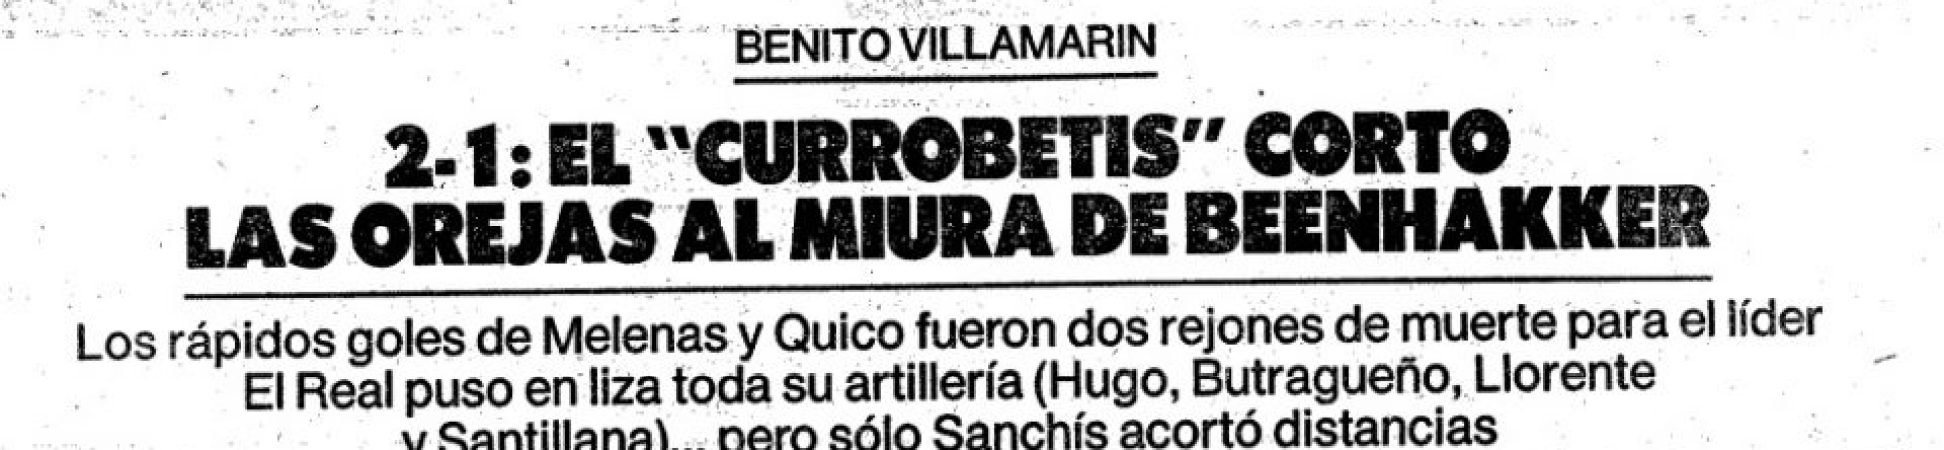 Hoy hace 33 años. Betis 2 Real Madrid 1.